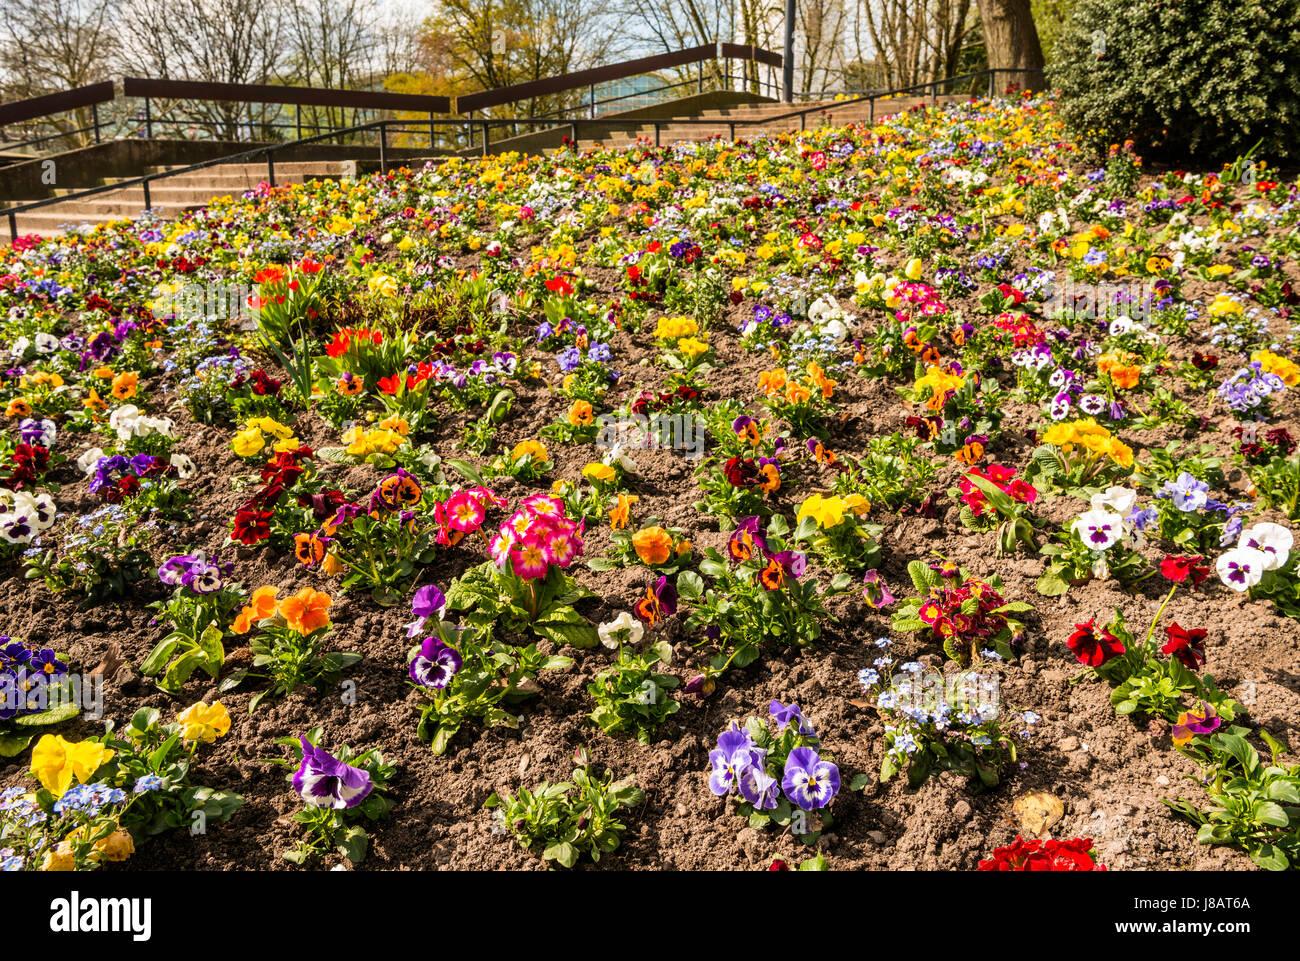 Flowerbed With Colorful Spring Flowers Planten Un Blomen Hamburg